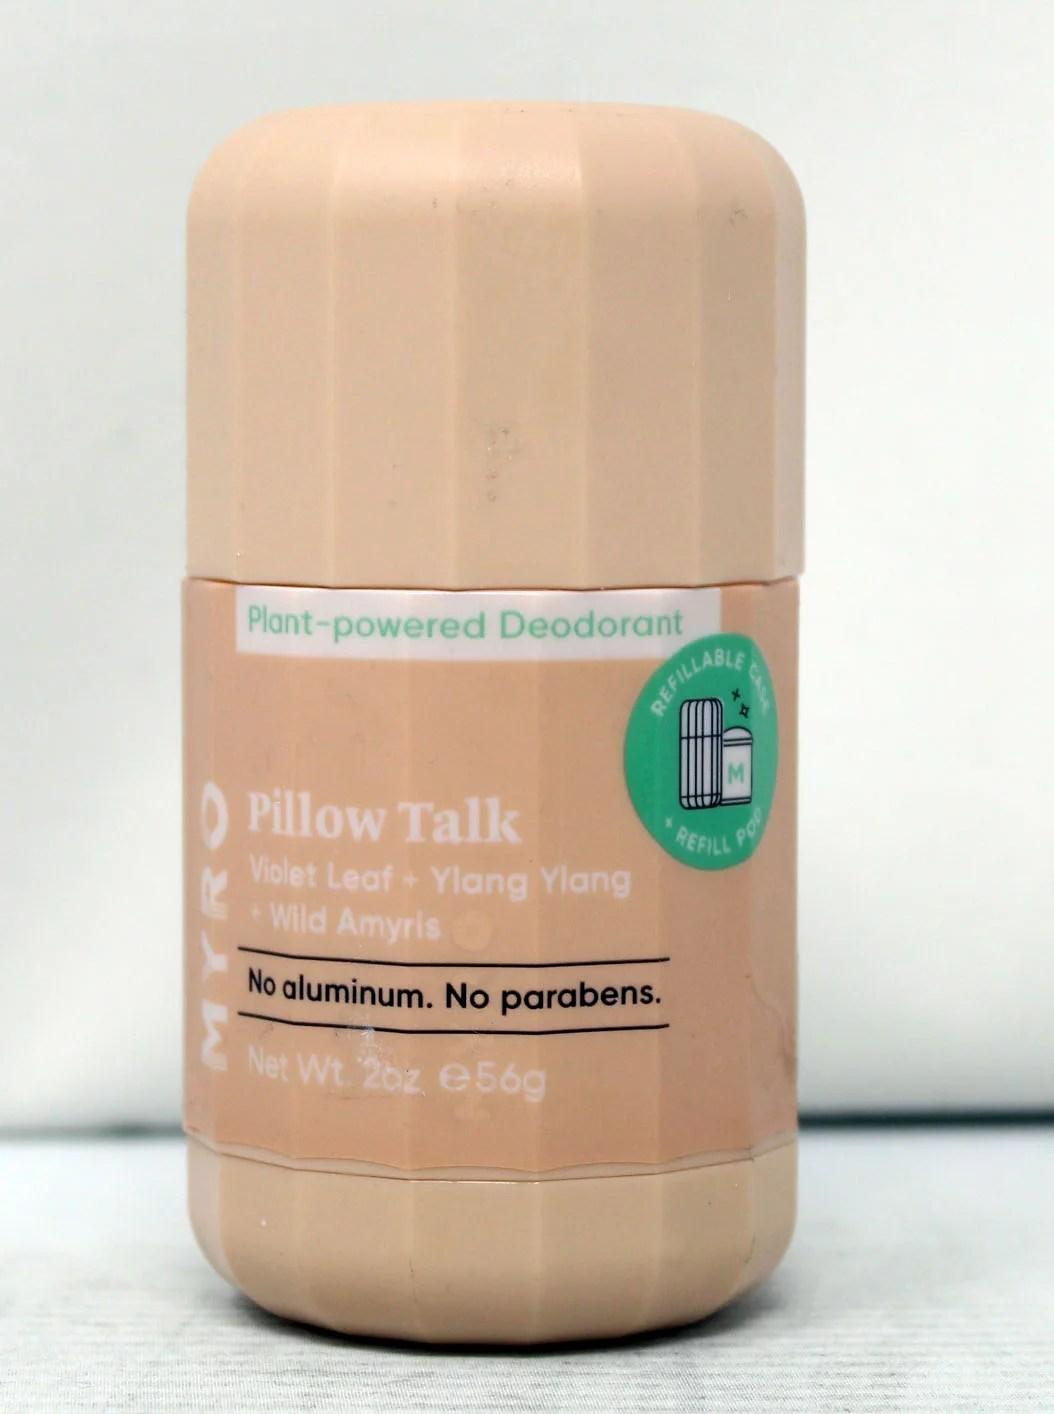 myro pillow talk violet leaf ylang ylang wild amyris plant powered deodorant walmart com